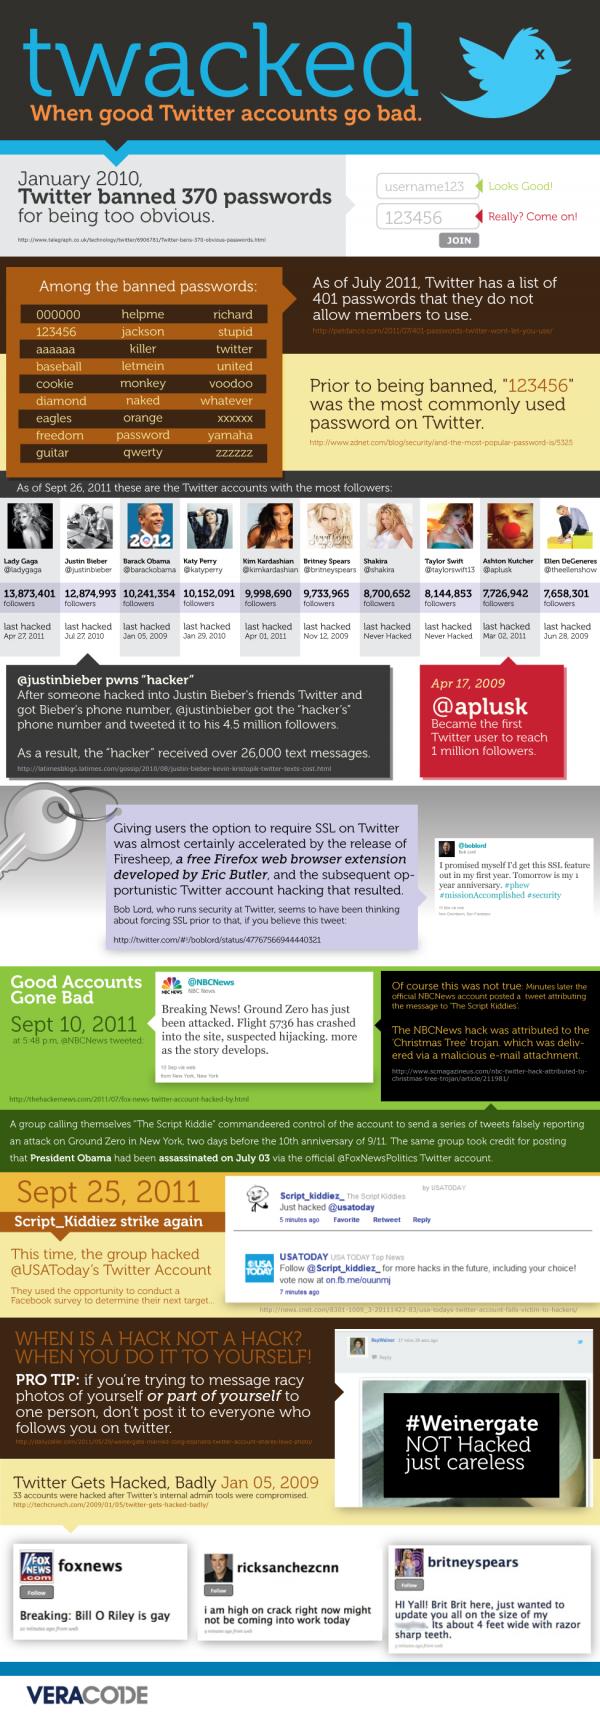 infographic-on-social-media-18